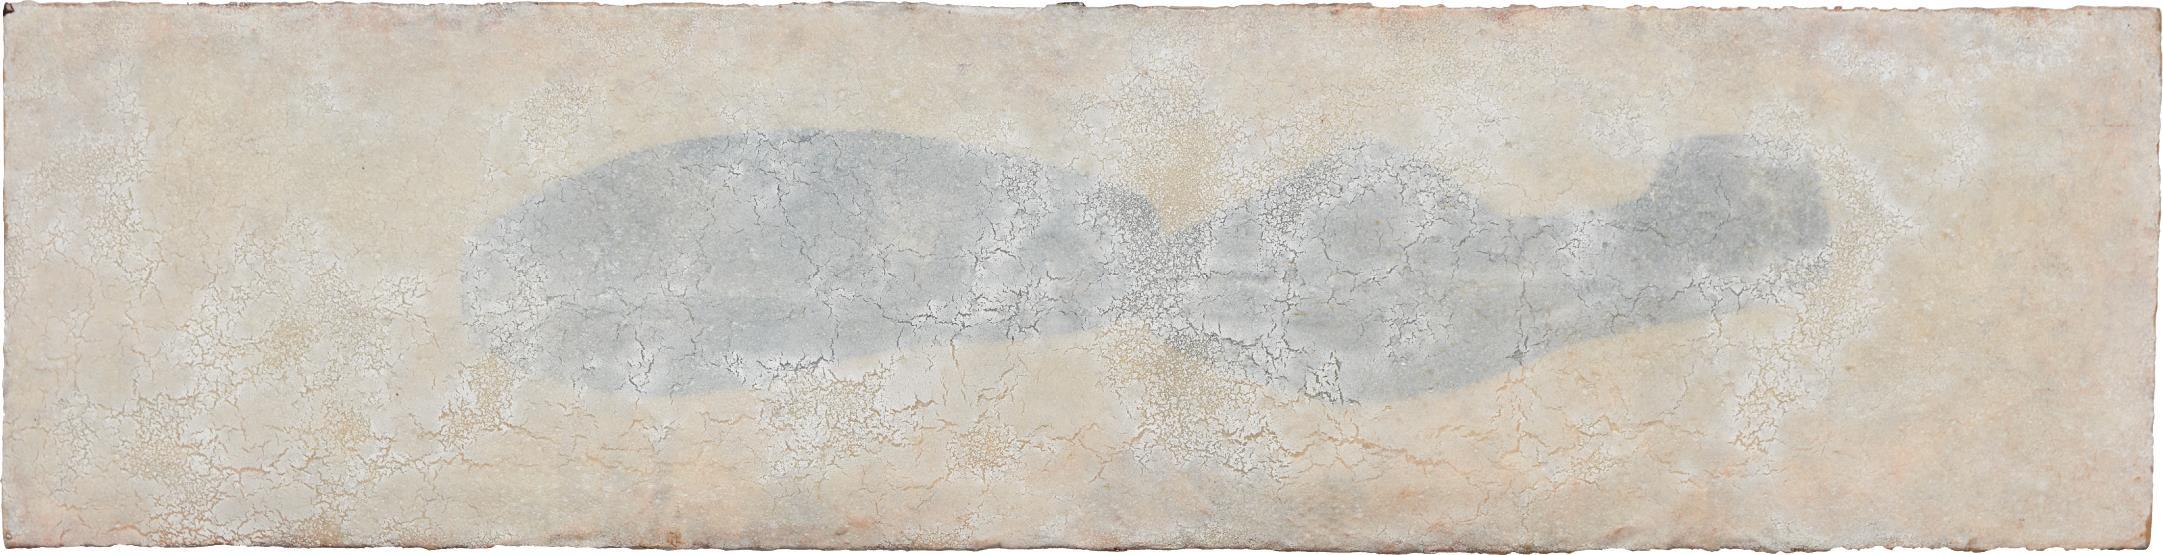 Jose Maria Sicilia-Untitled-1989